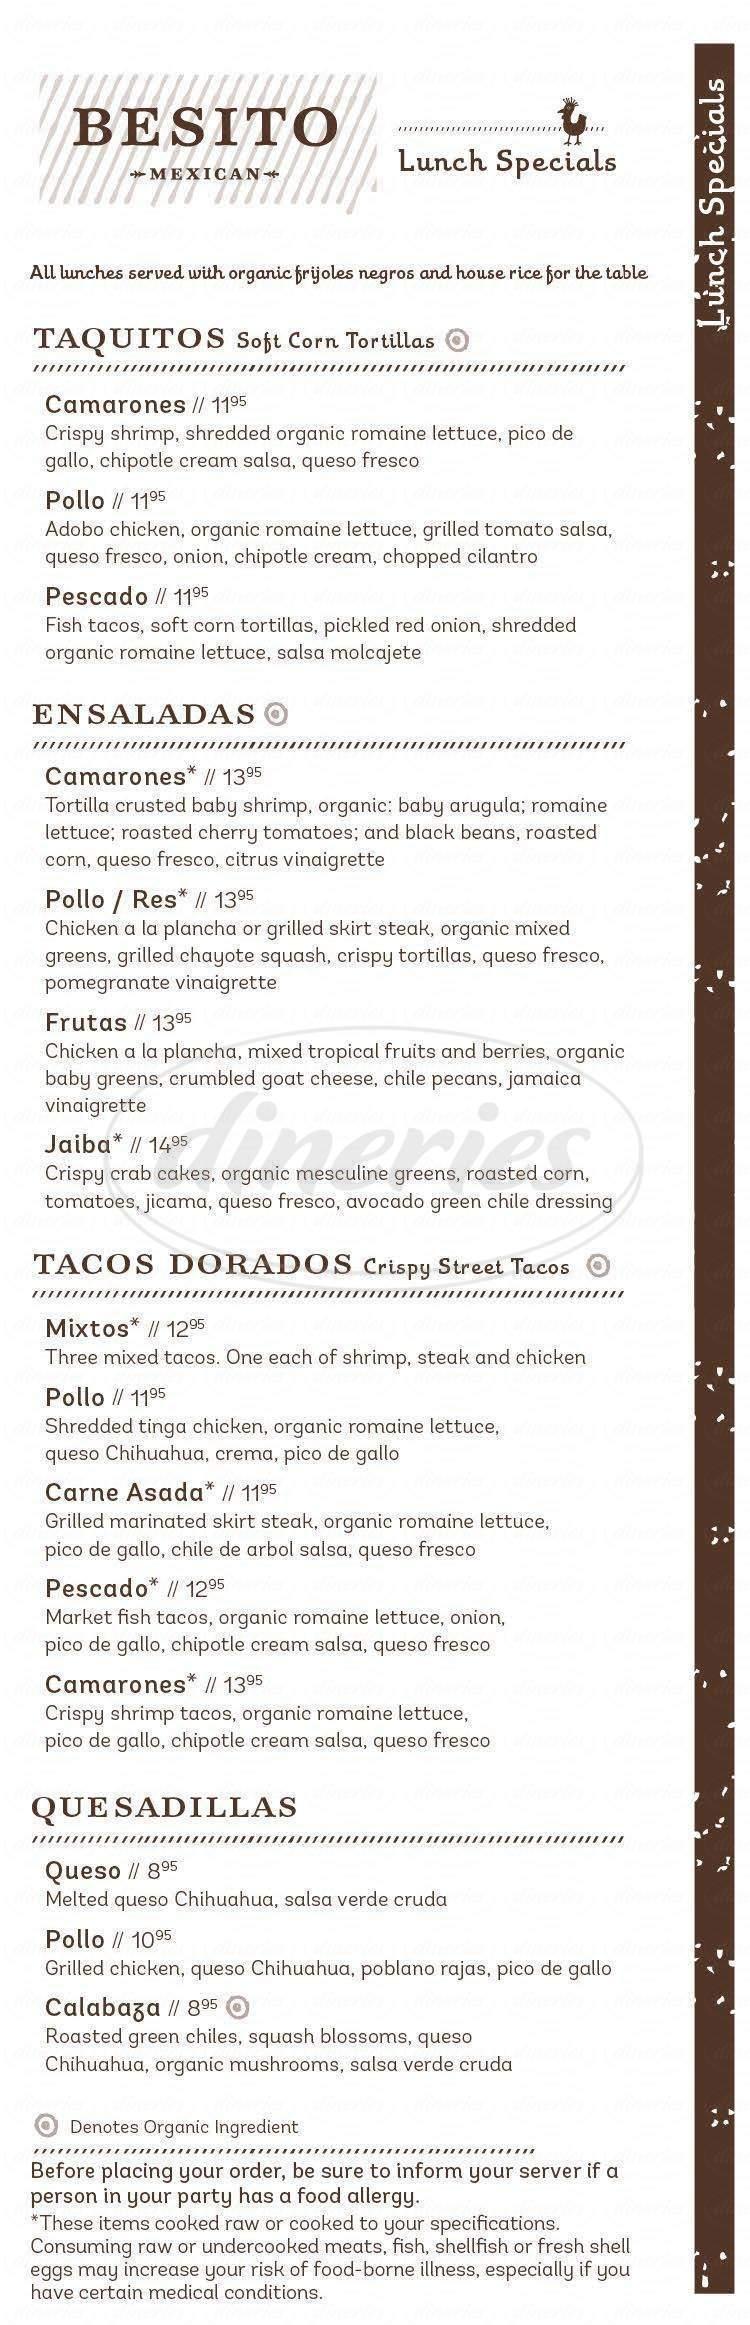 menu for Besito